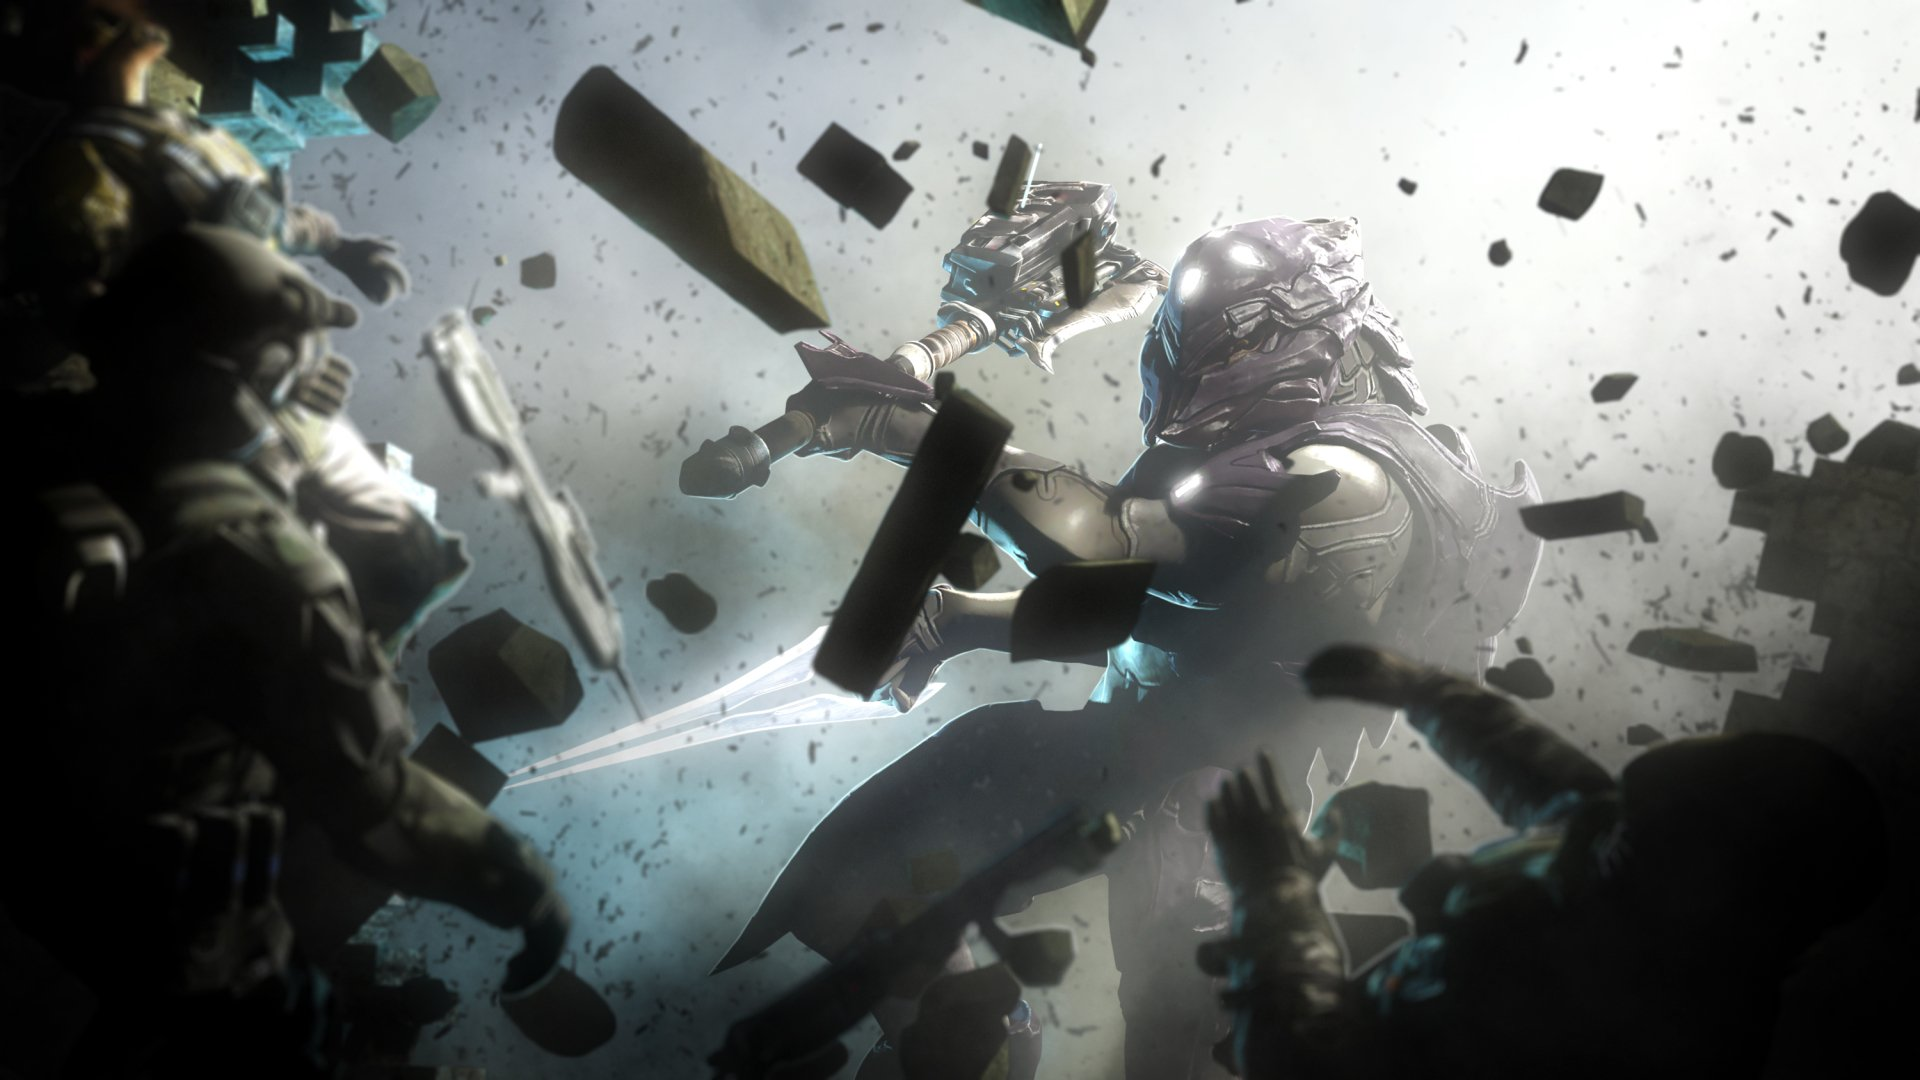 Halo wars 2 awakening the nightmare wallpapers - Wallpaper halo wars ...